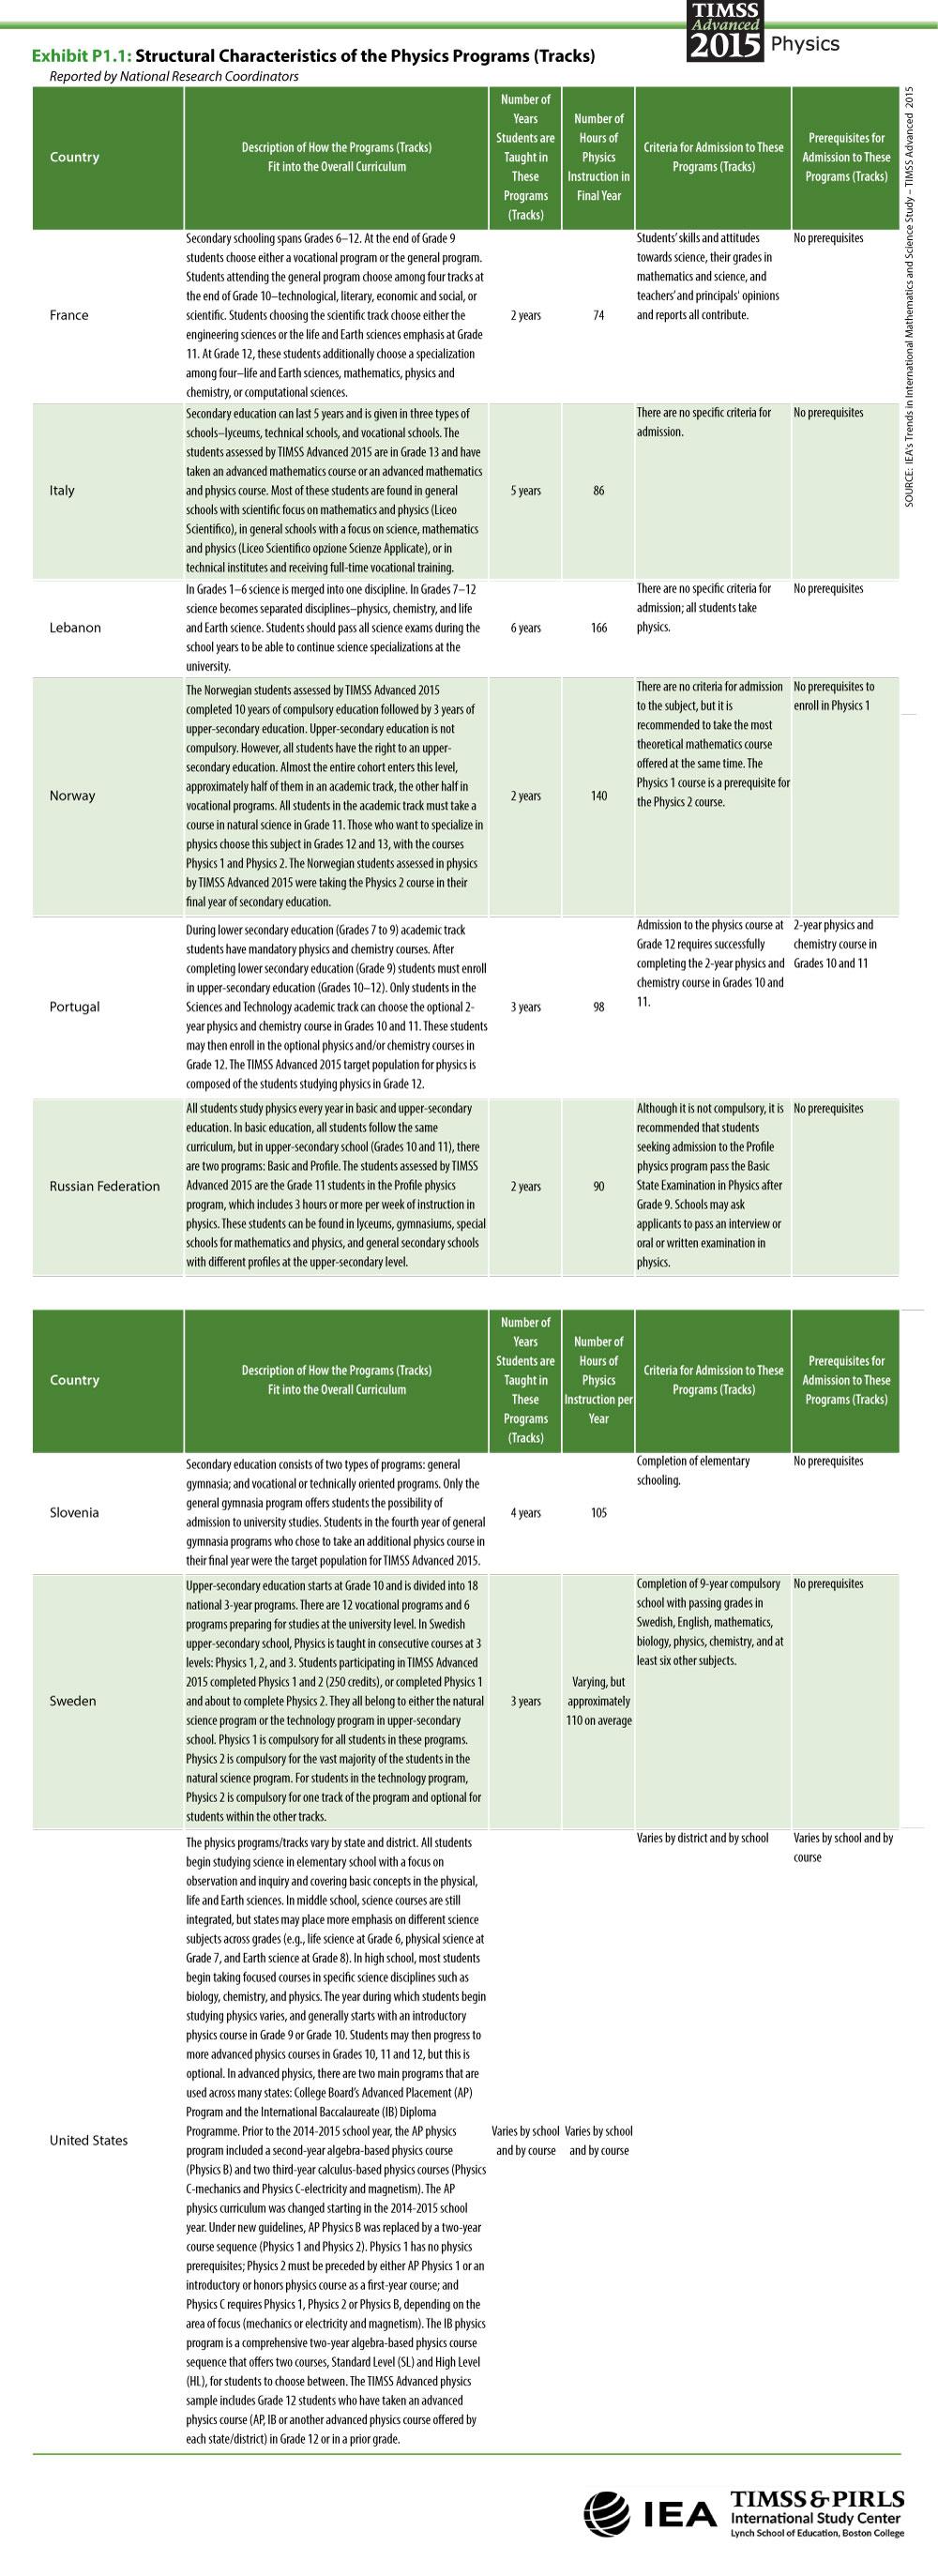 Characteristics of Physics Programs Table